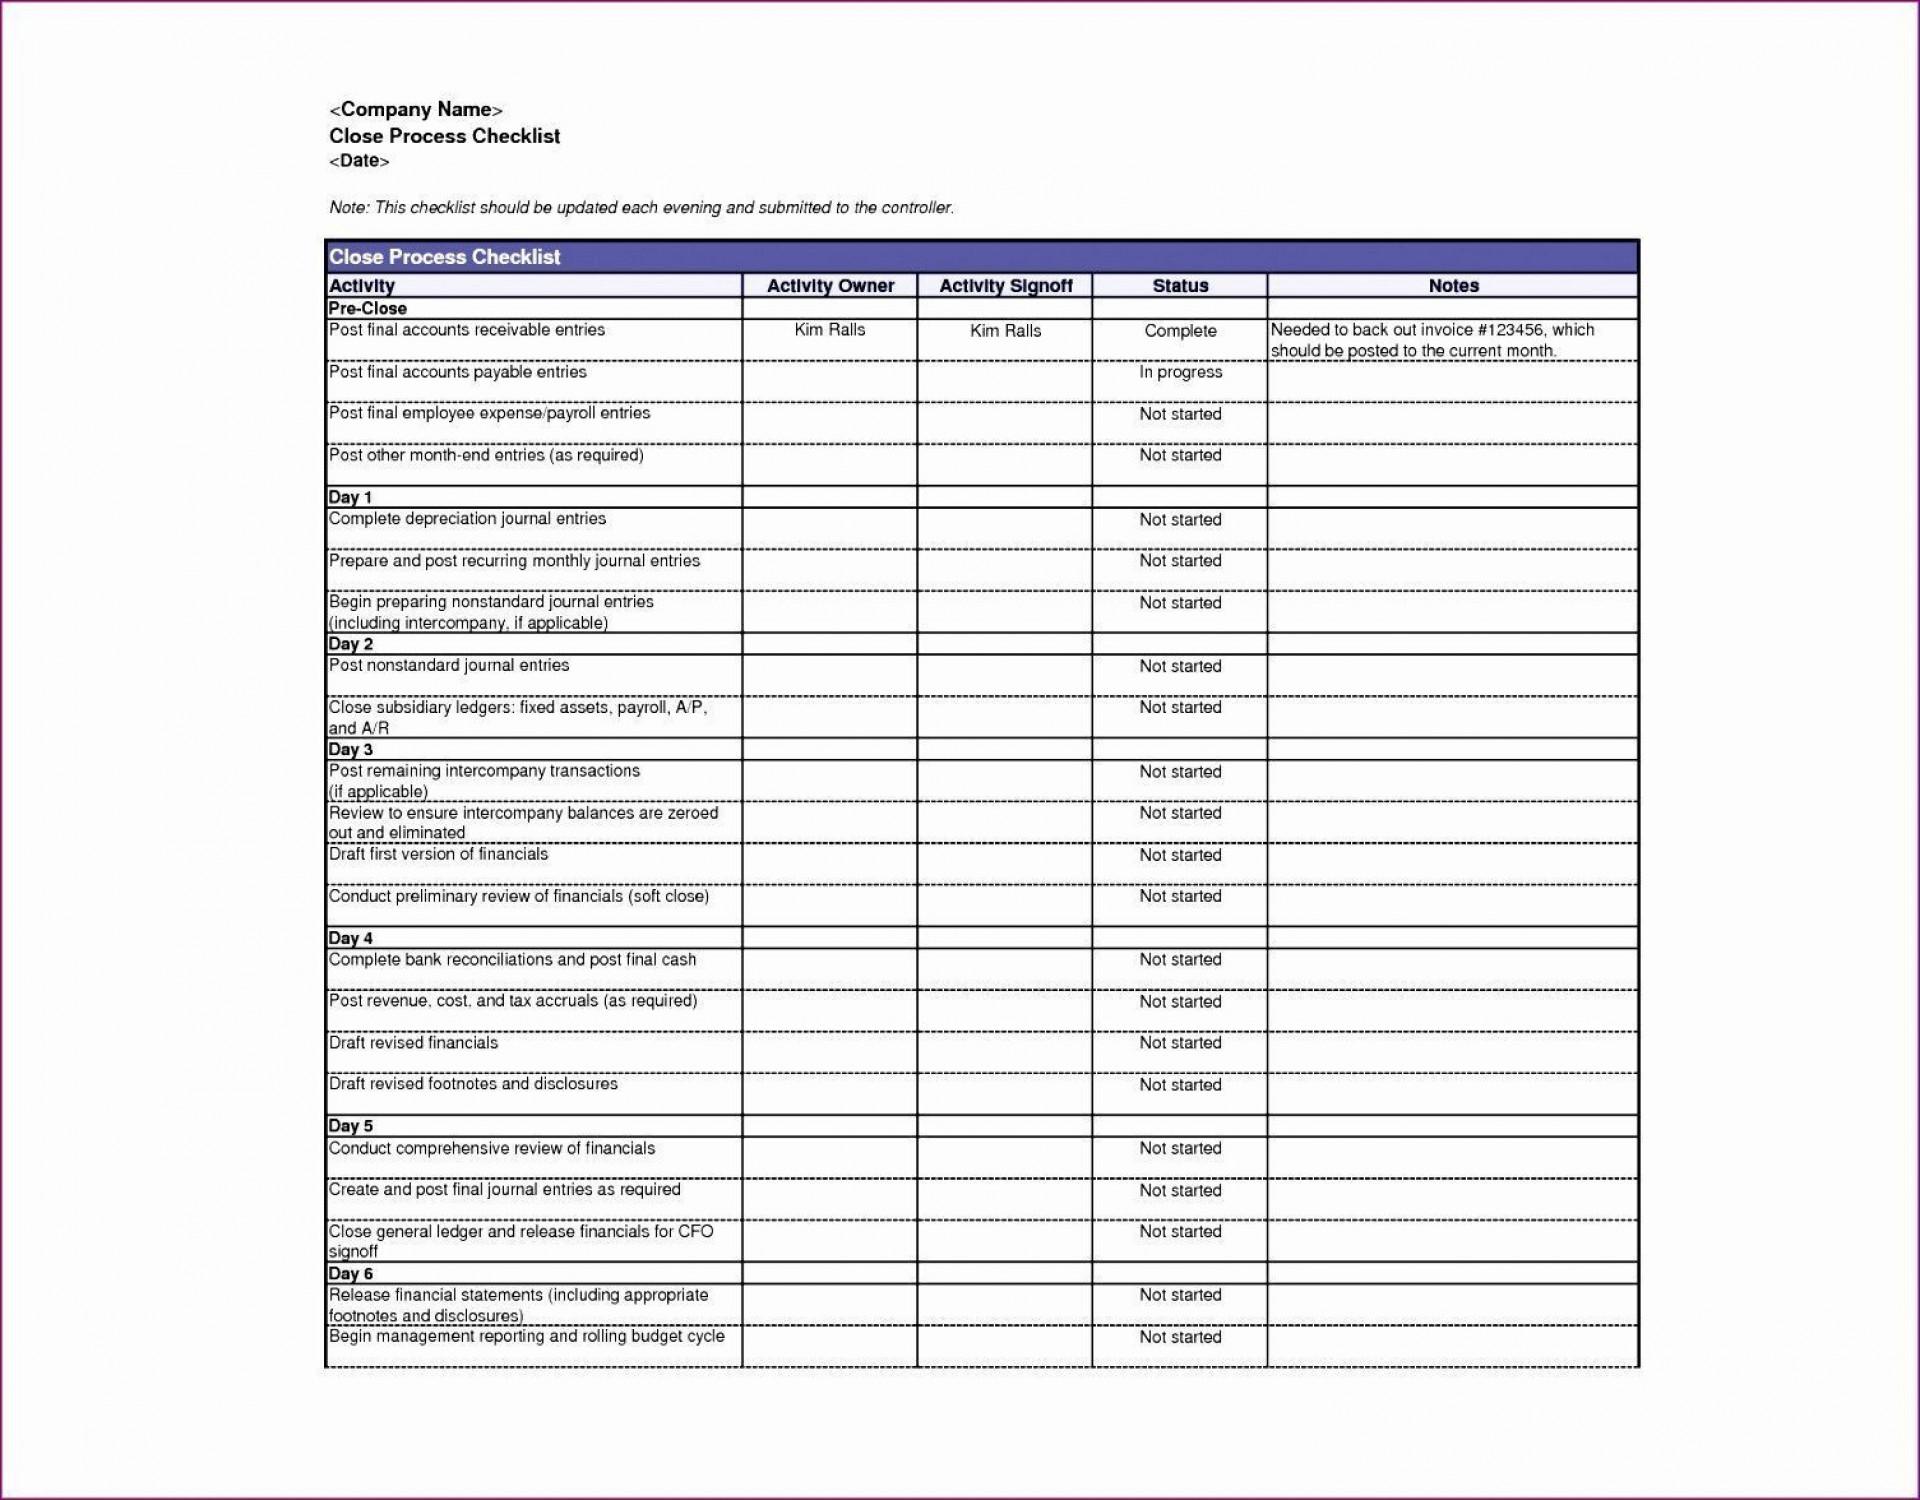 004 Best Free Event Planner Checklist Template Design  Planning Party1920